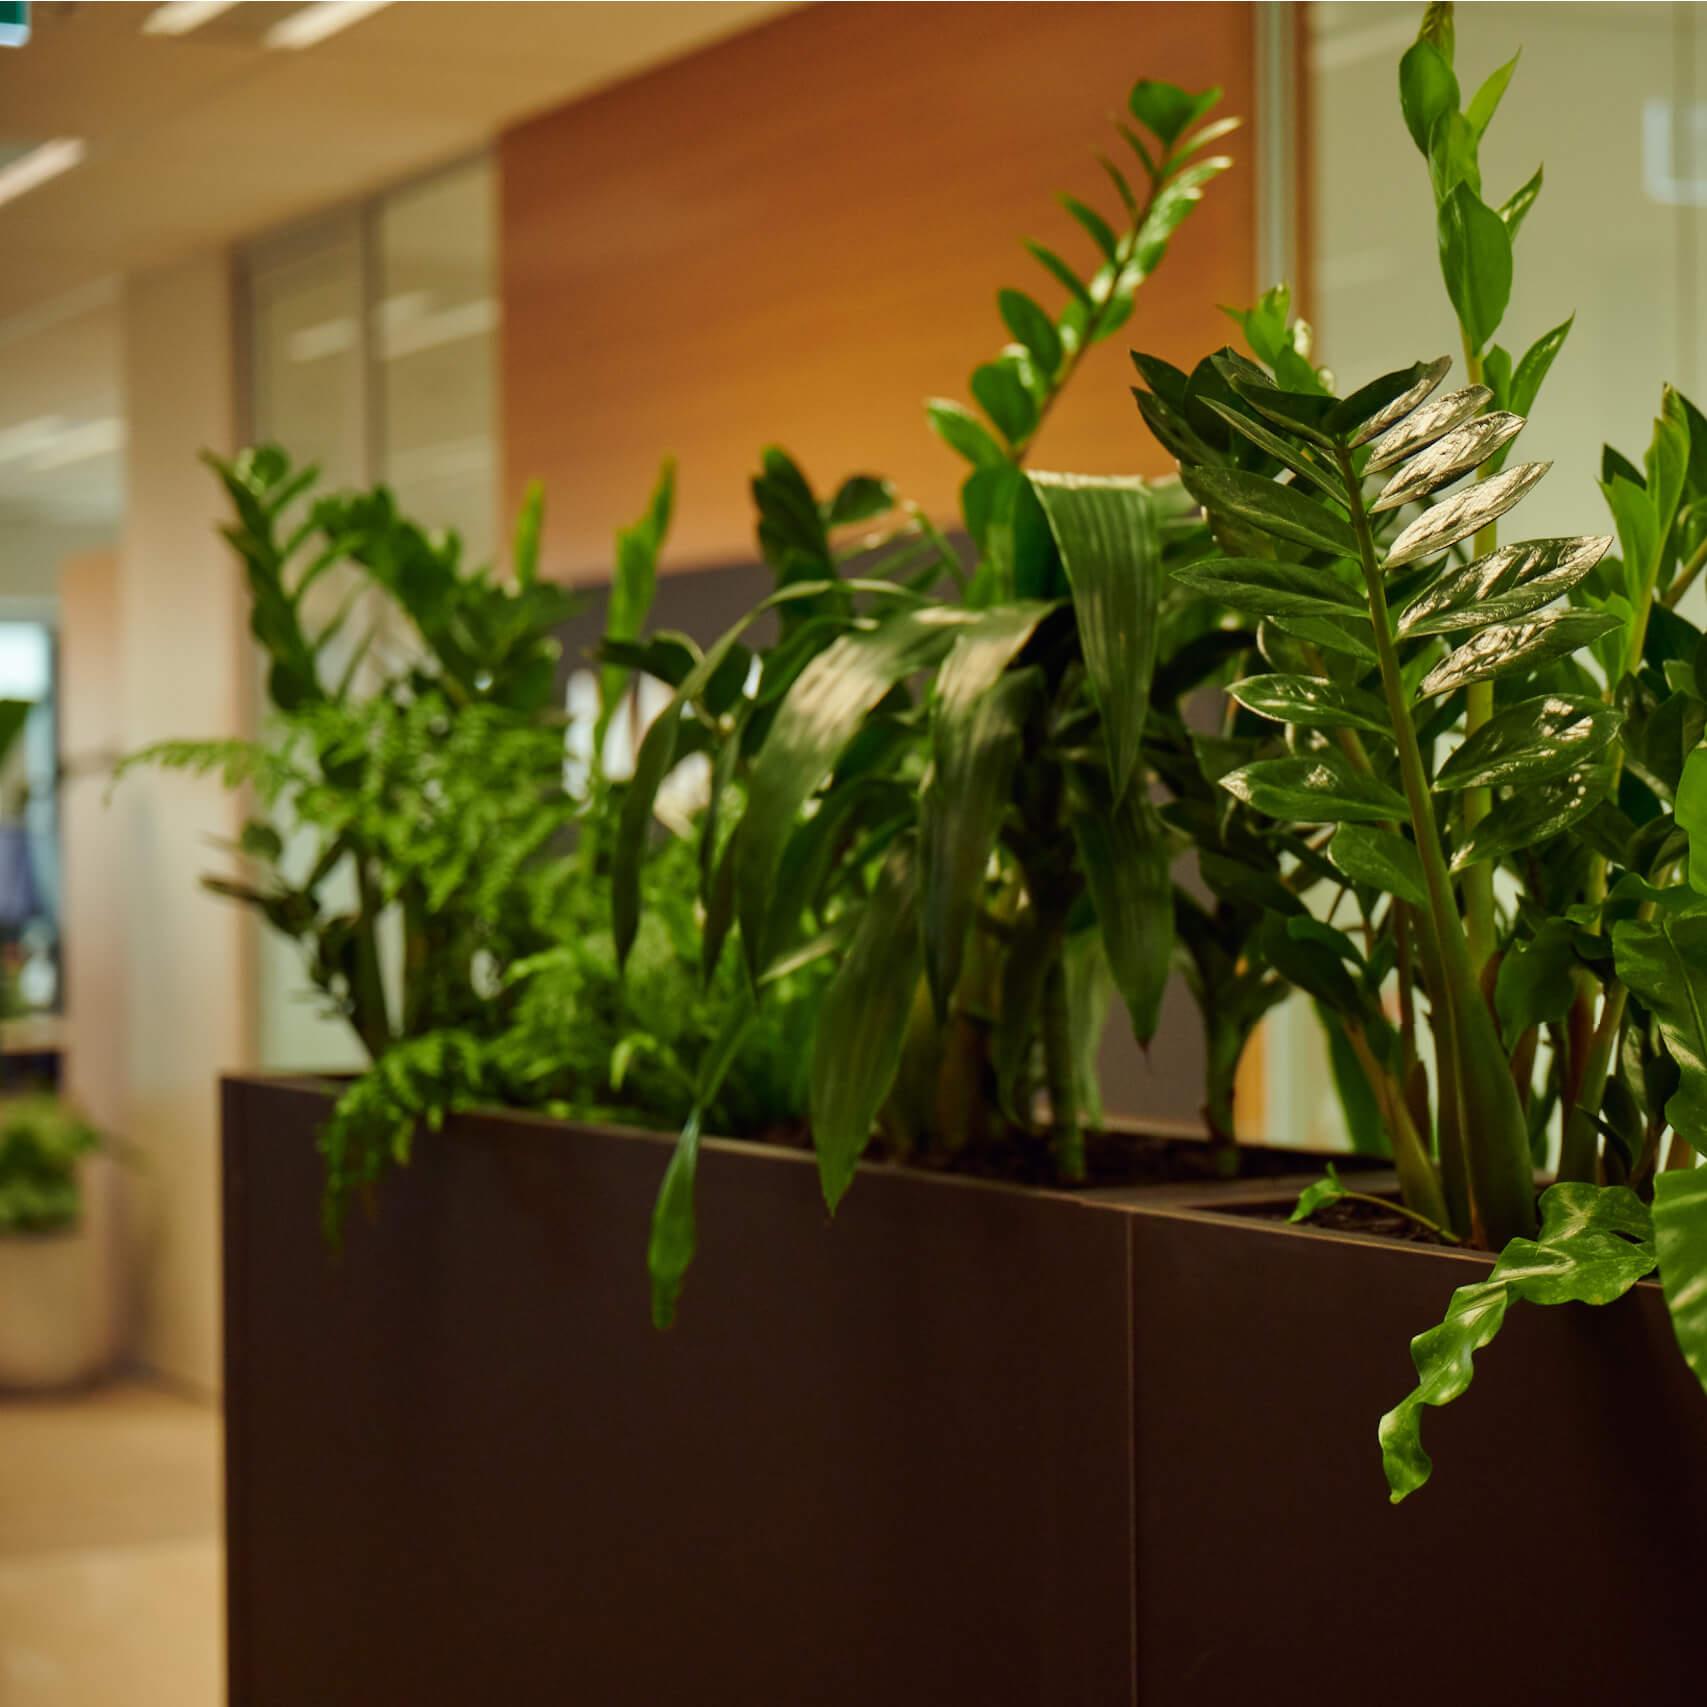 portfolio-offices-spaces-martinjenkins-image6